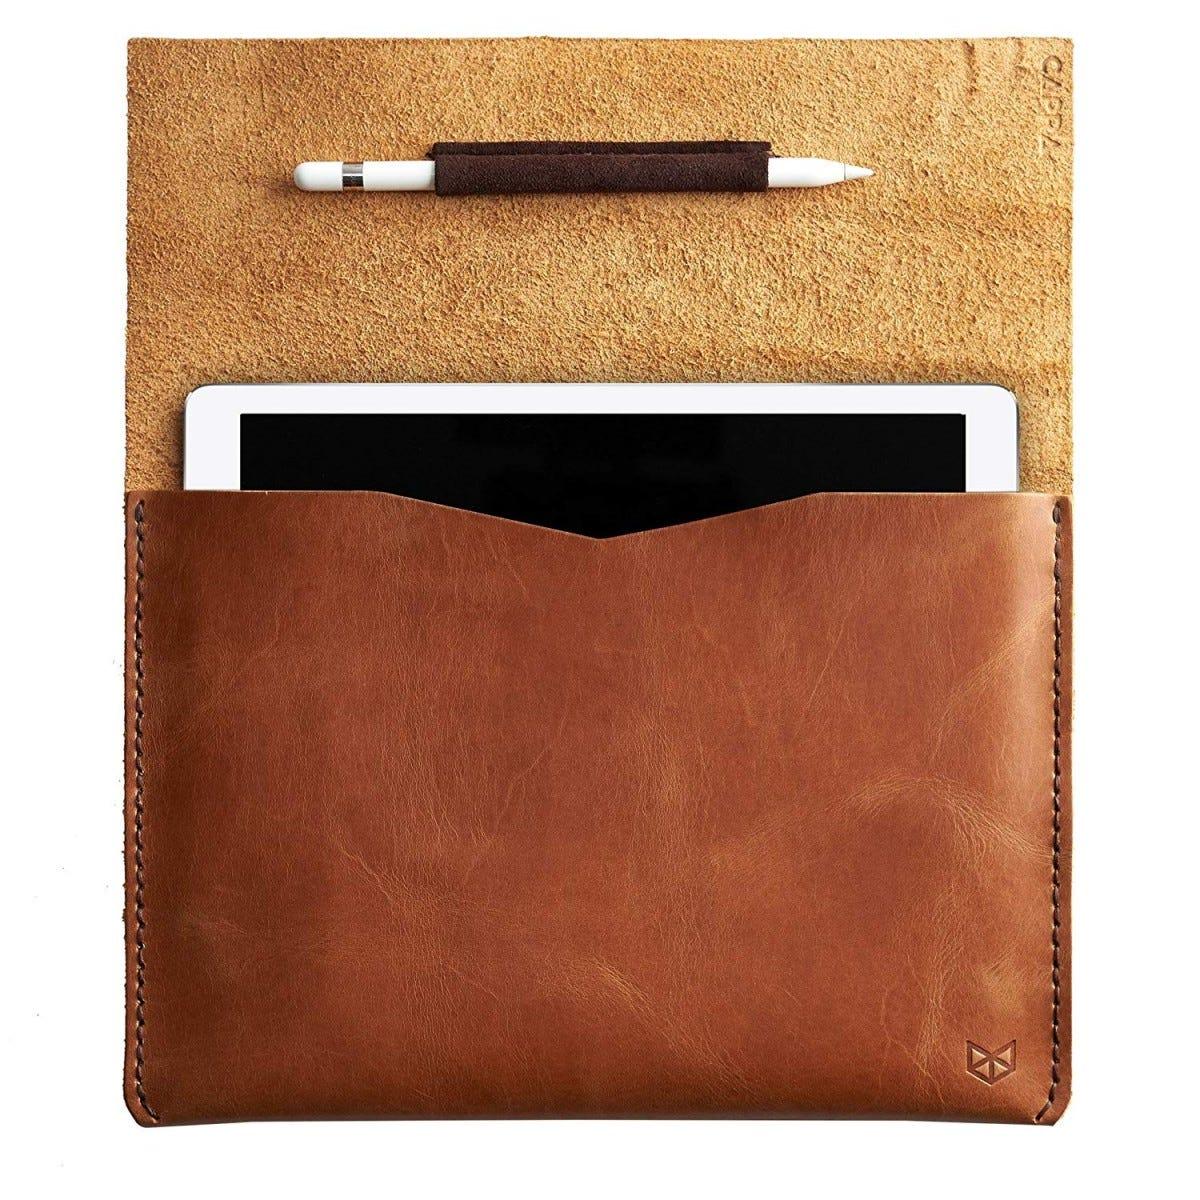 leather, ipad, ipad case, premium, sleeve, capra, capra leather